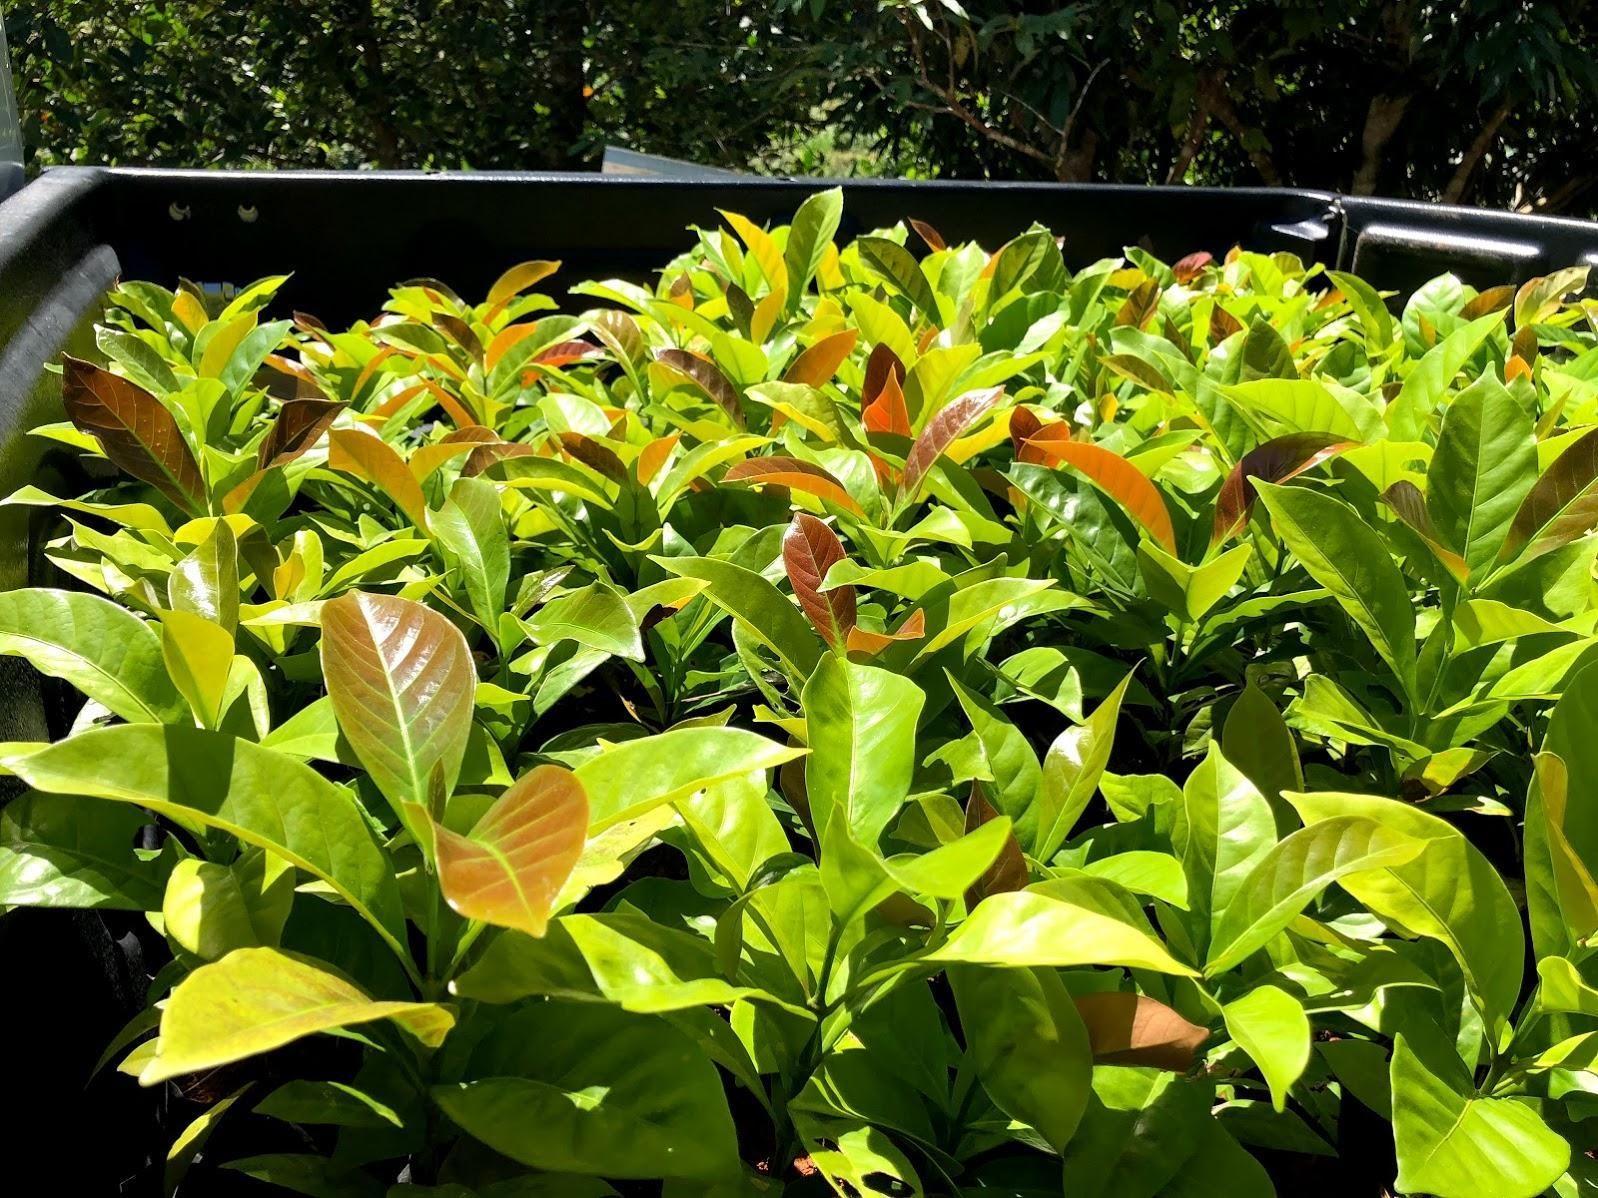 Liberica Coffee - Origin & Biological Characteristics - Helena., JSC: Liberica coffee seedlings are transported to a farm in Kampung Karu, Padawan, Malaysia  Source: Perfectdailygrind